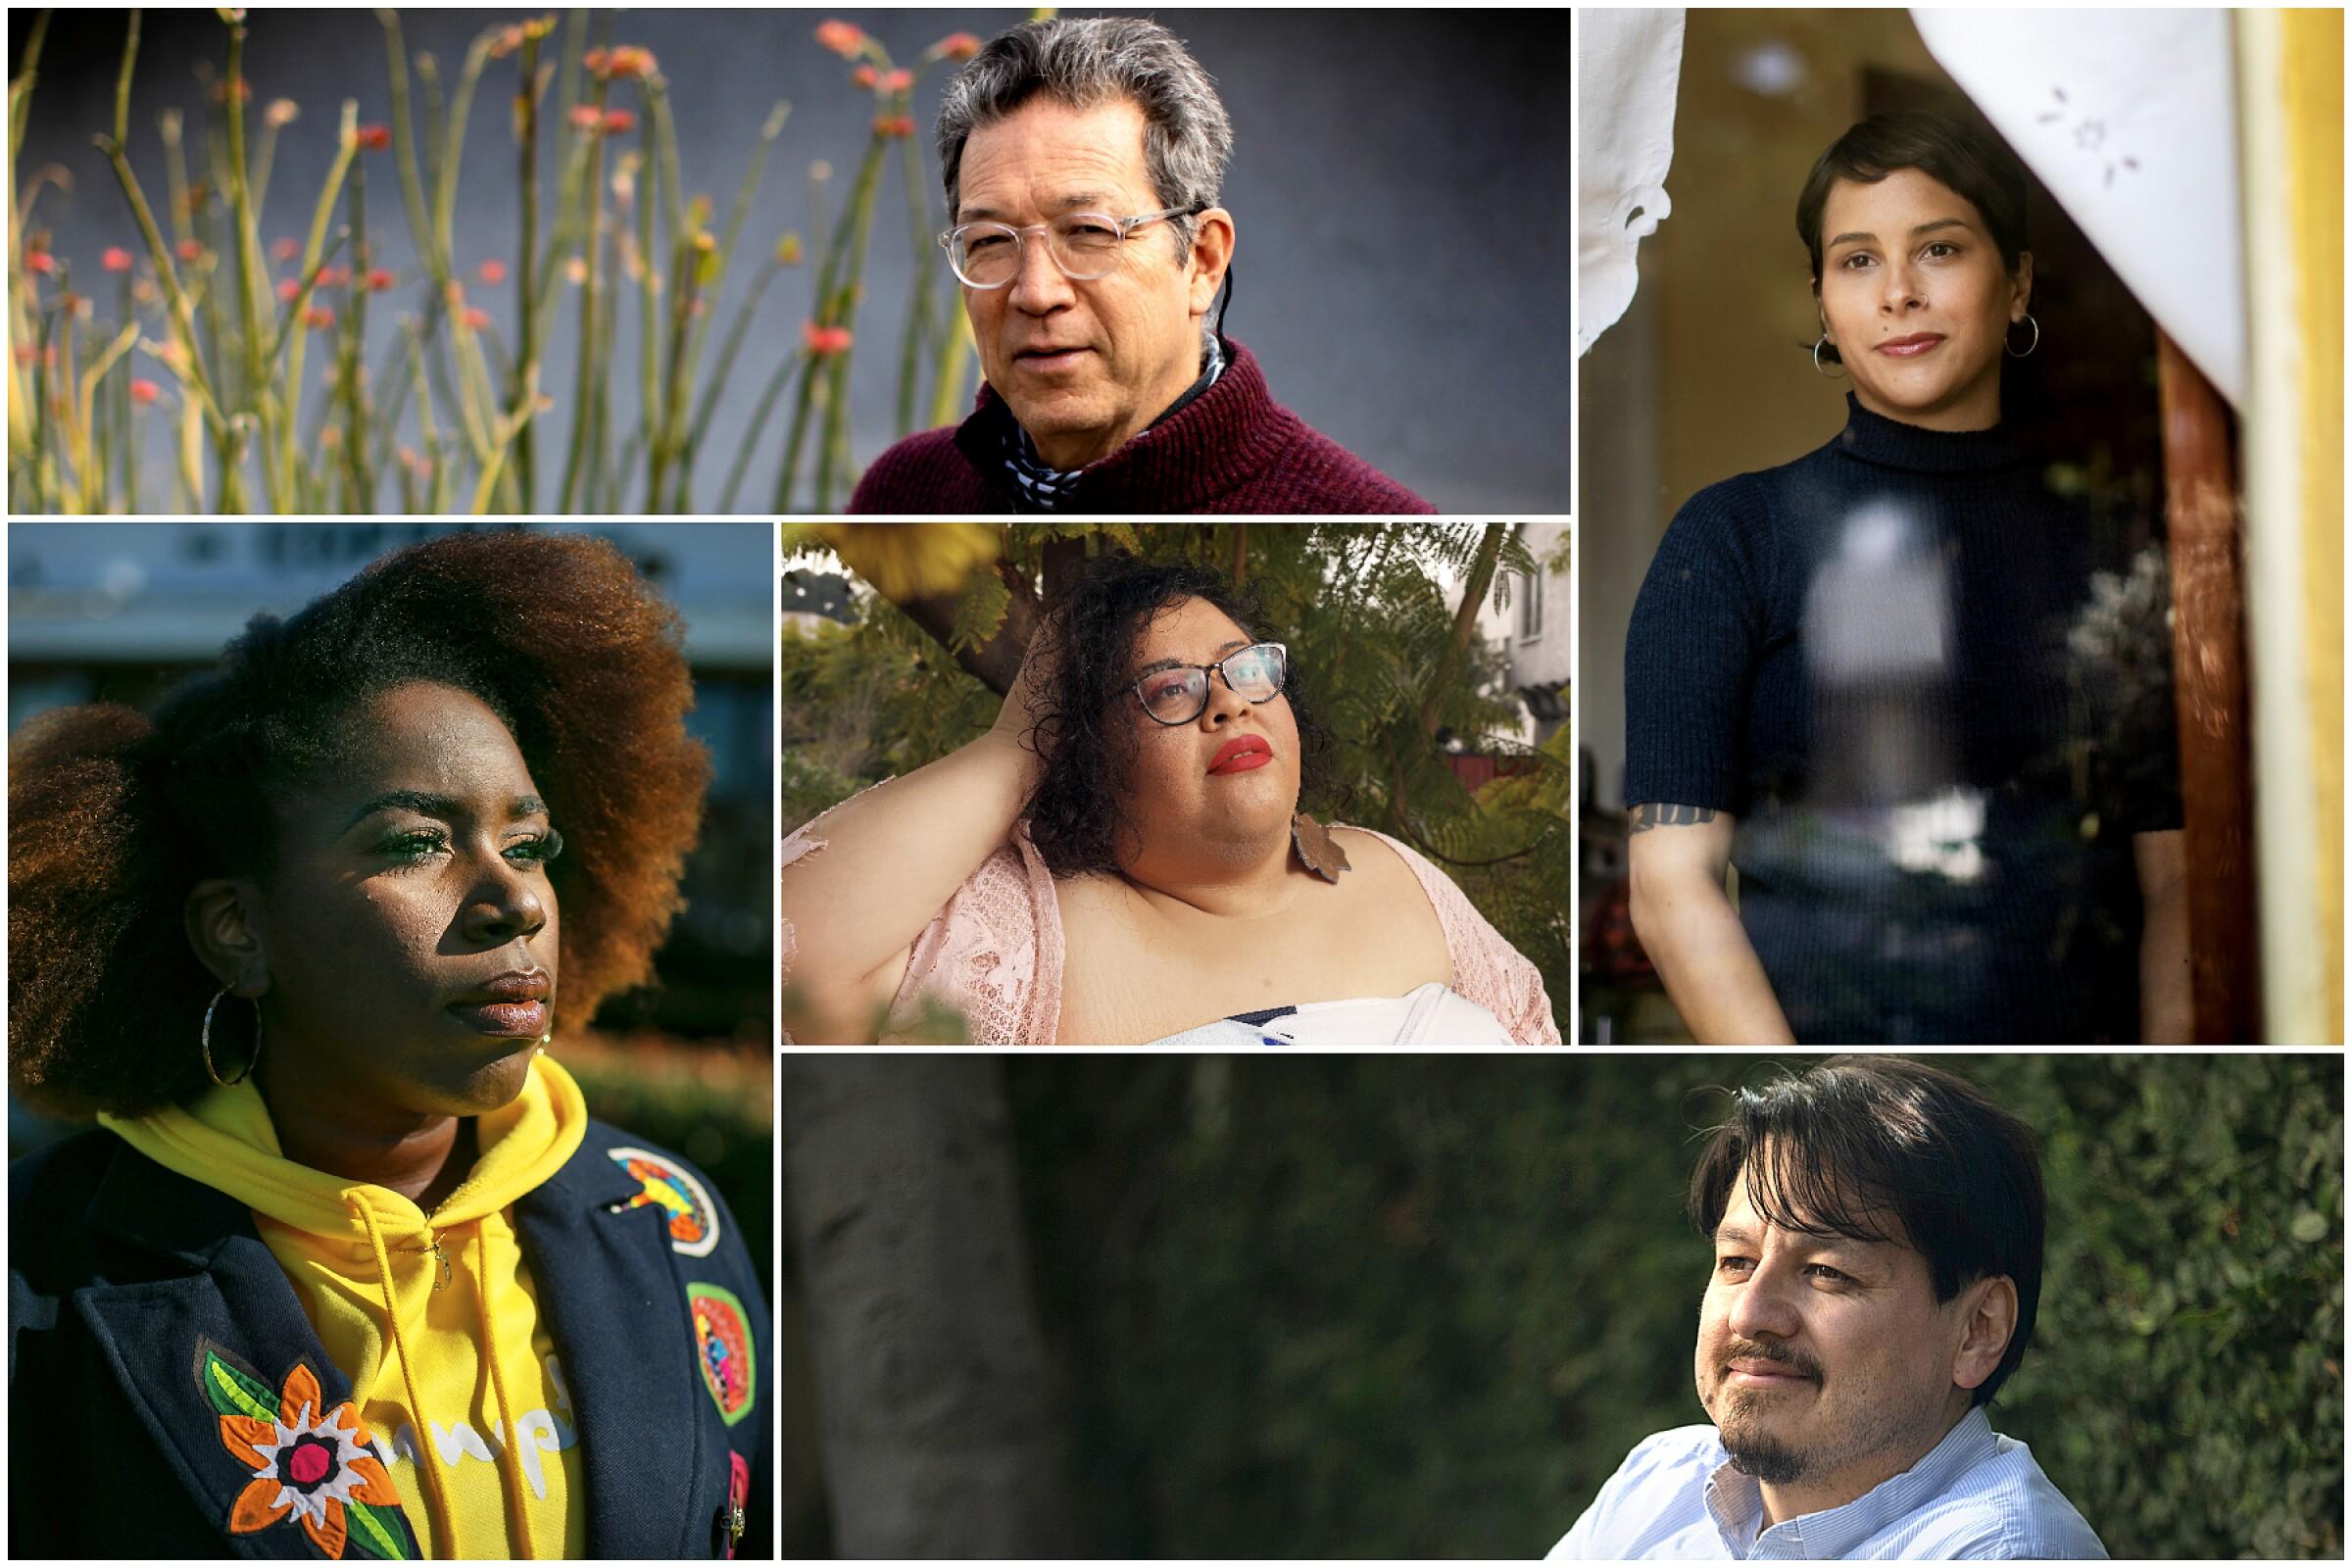 Sesshu Foster, Megan Dorame, William Archila, Yesika Salgado, and Jenise Miller.